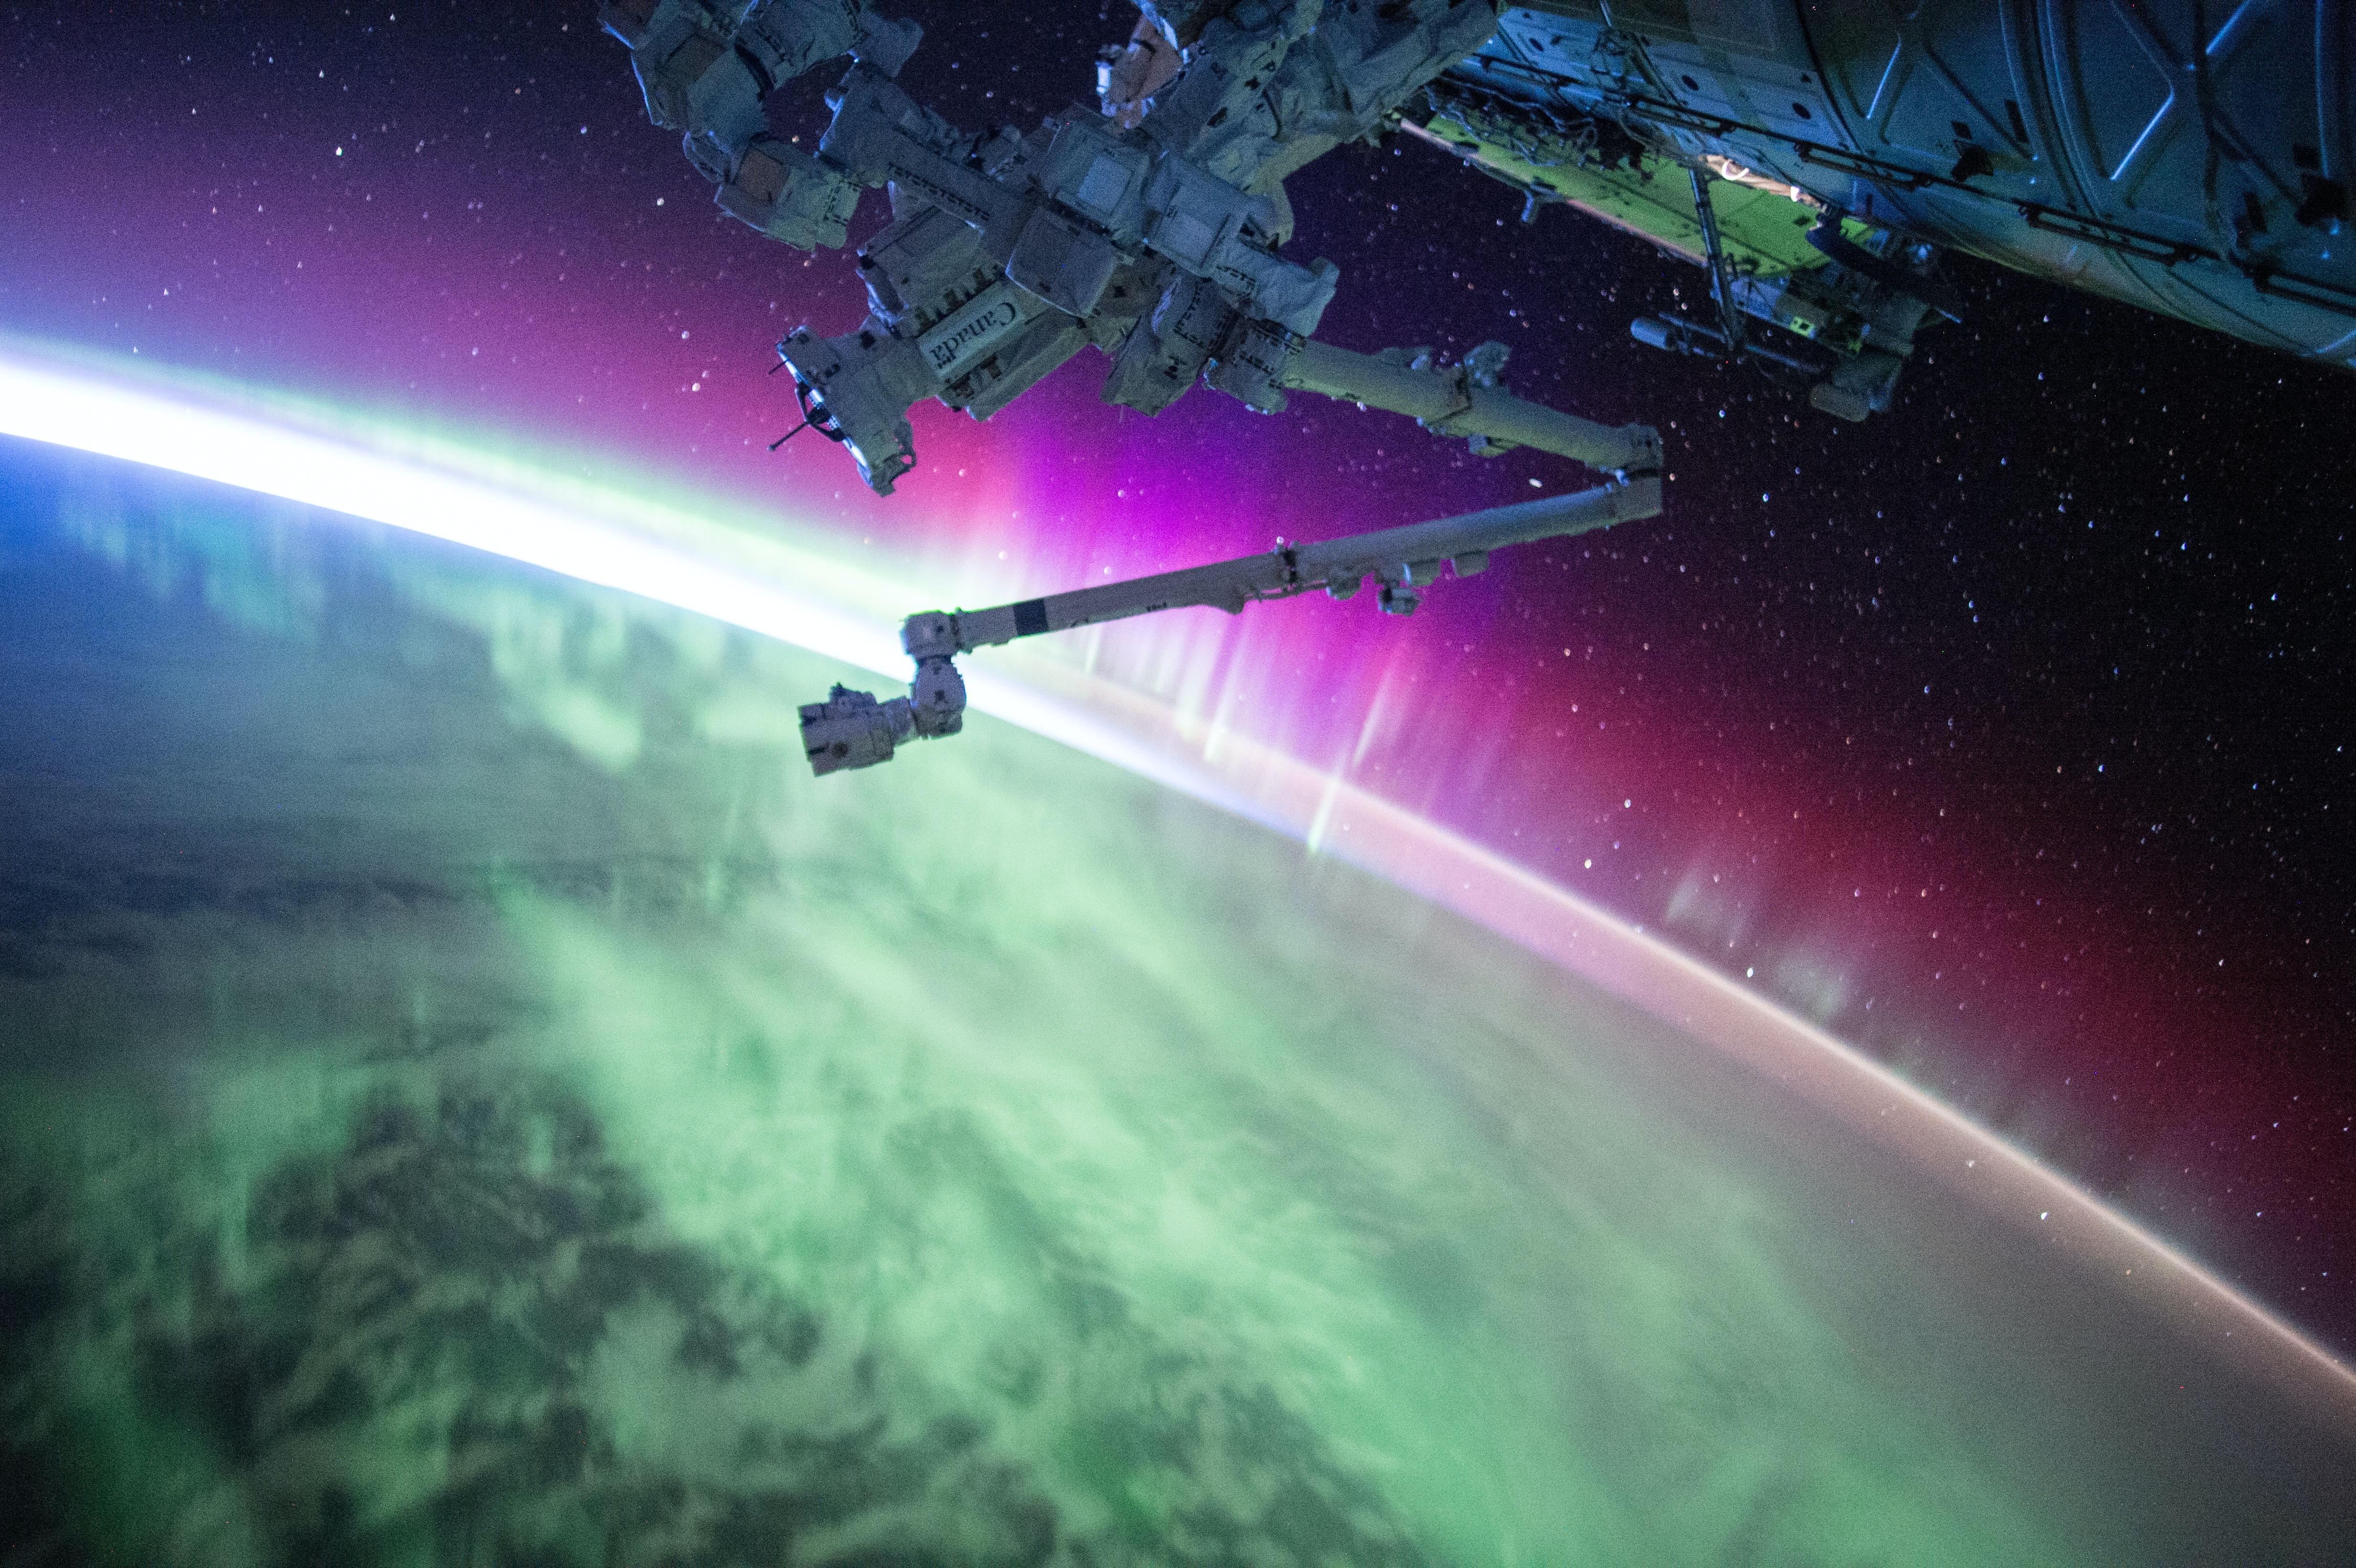 photography of purple and green aurora beam below grey space satellite